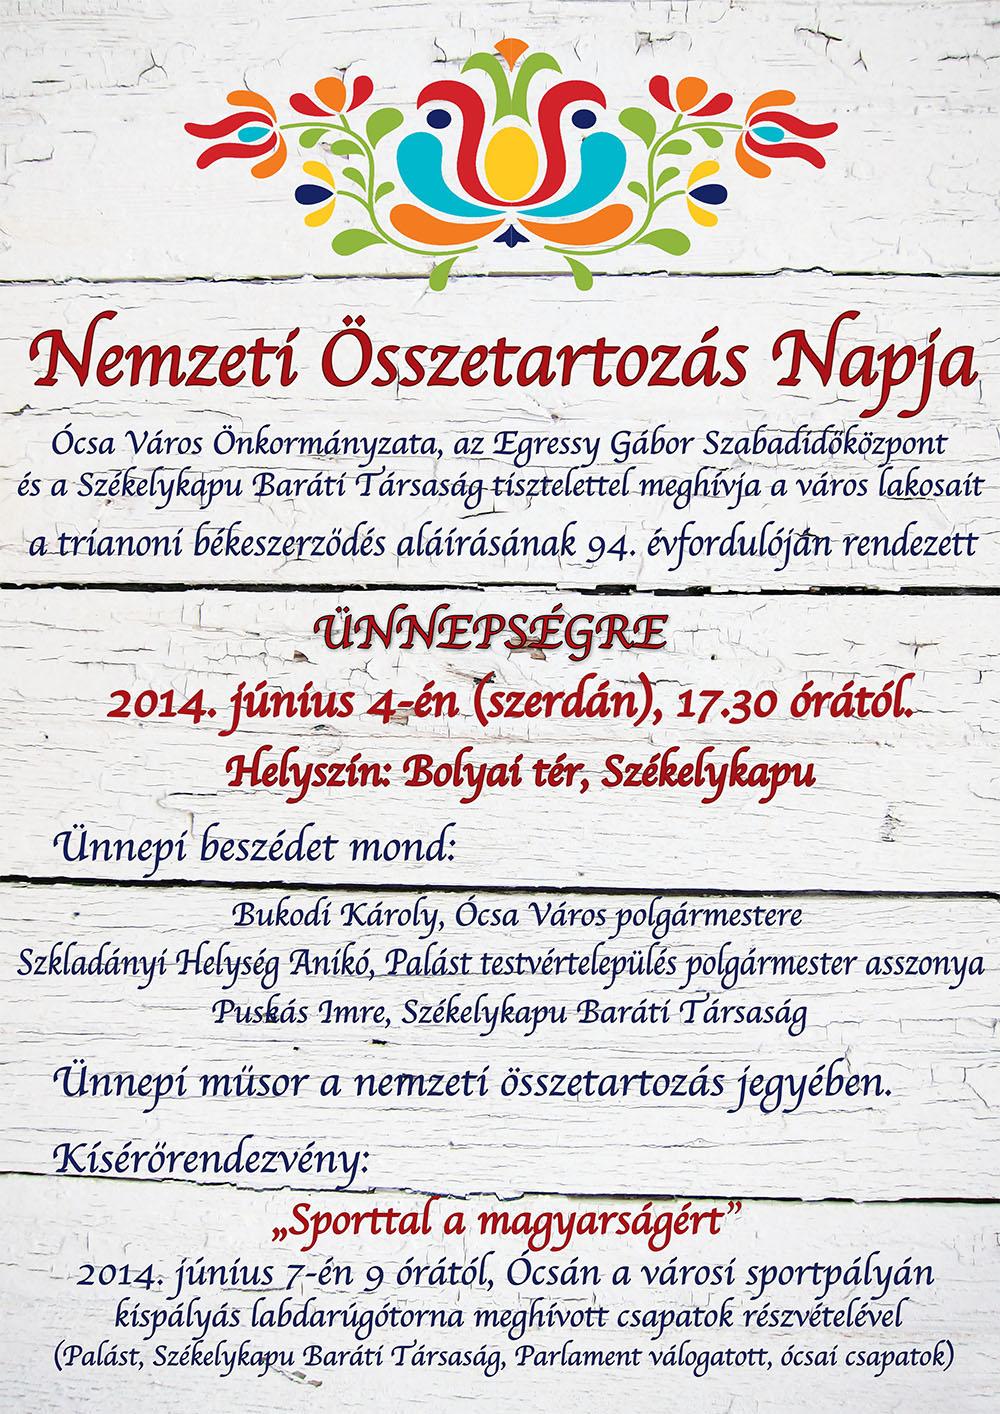 http://www.ocsa.hu/userfiles/image/20140520_osszatartozas.jpg